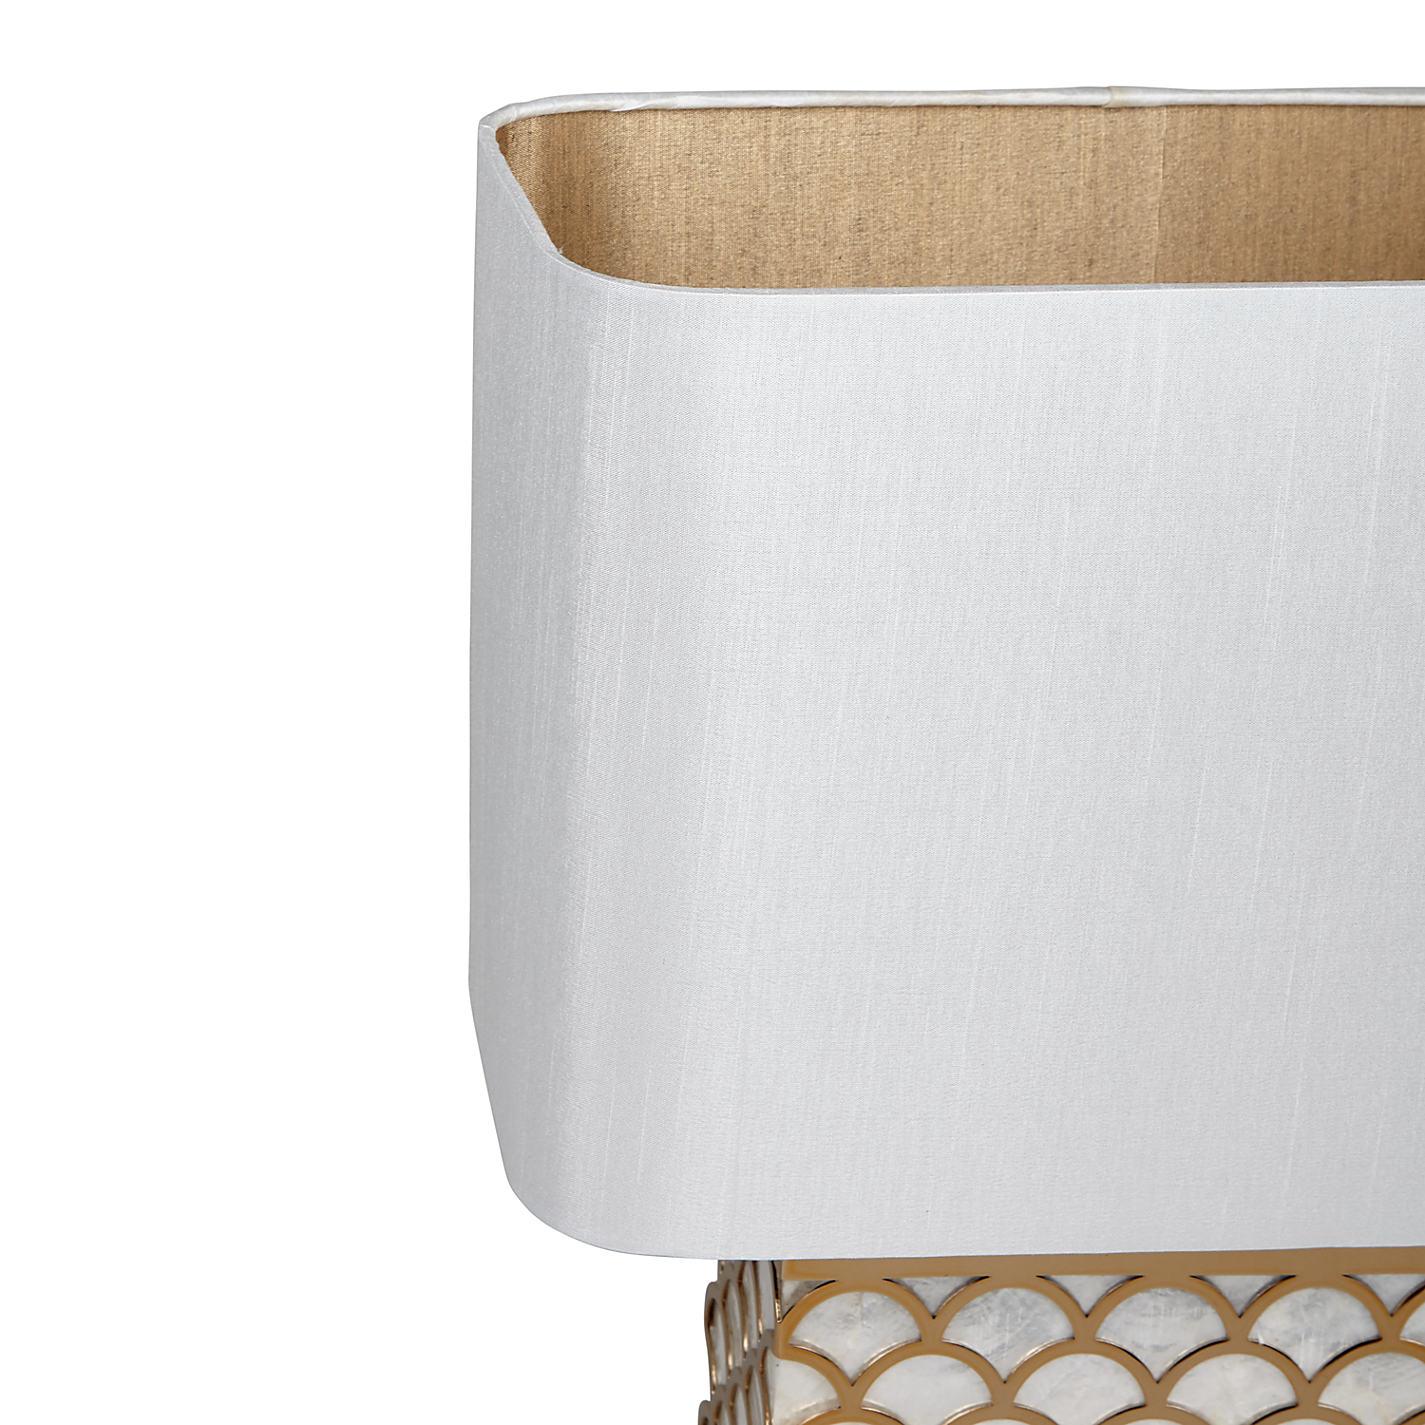 ... Buy John Lewis Delores Capiz Shell Table Lamp, Satin Brass Online At  Johnlewis.com ...